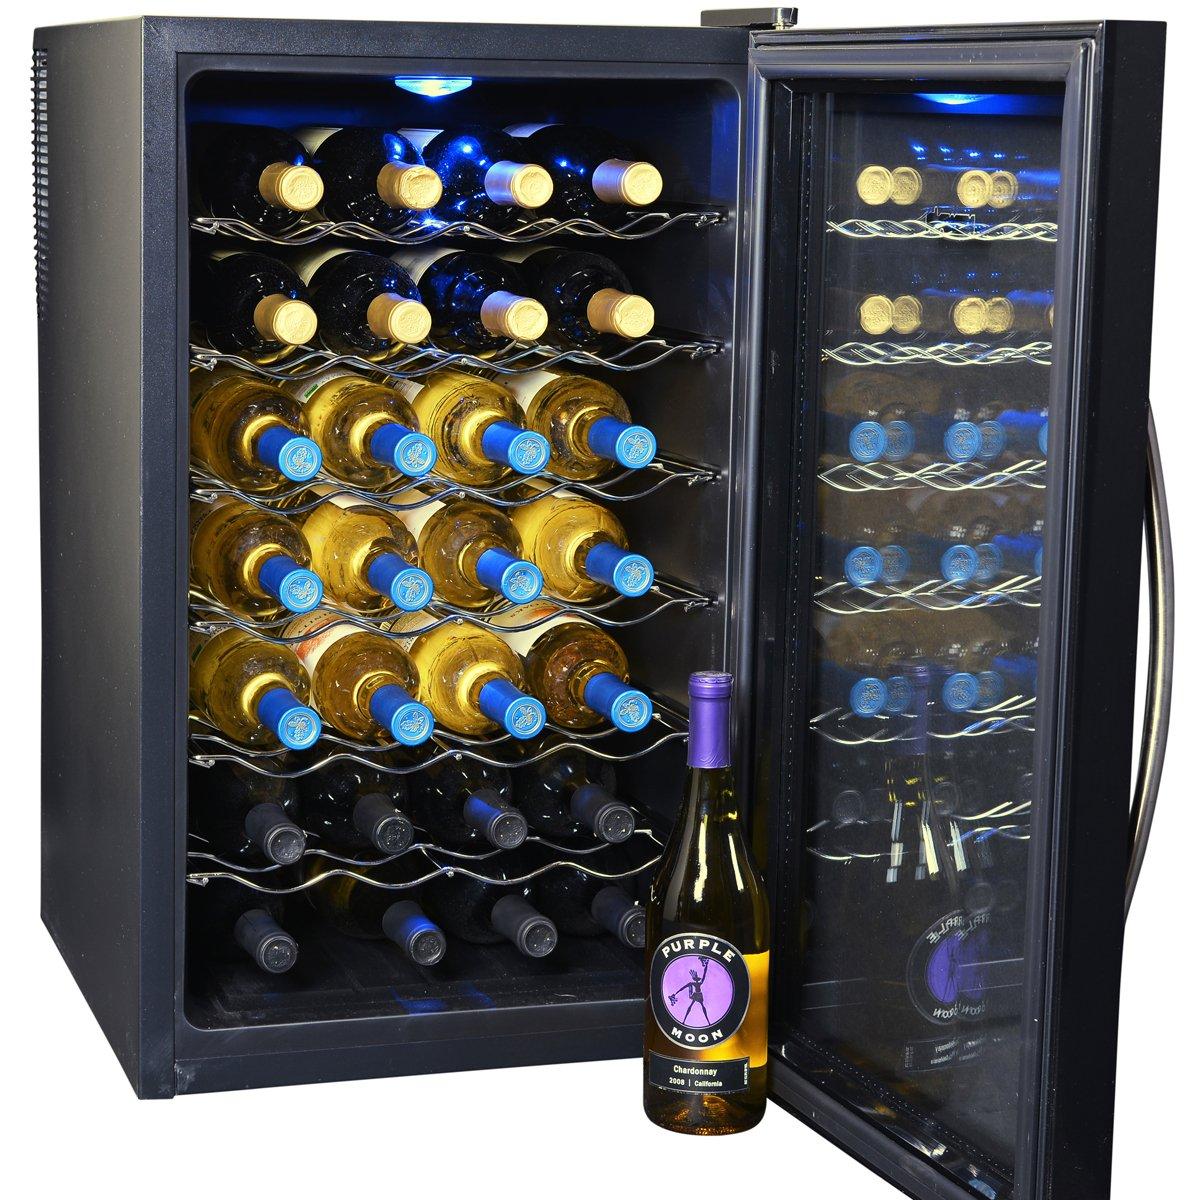 amazoncom newair aw280e 28 bottle wine cooler appliances